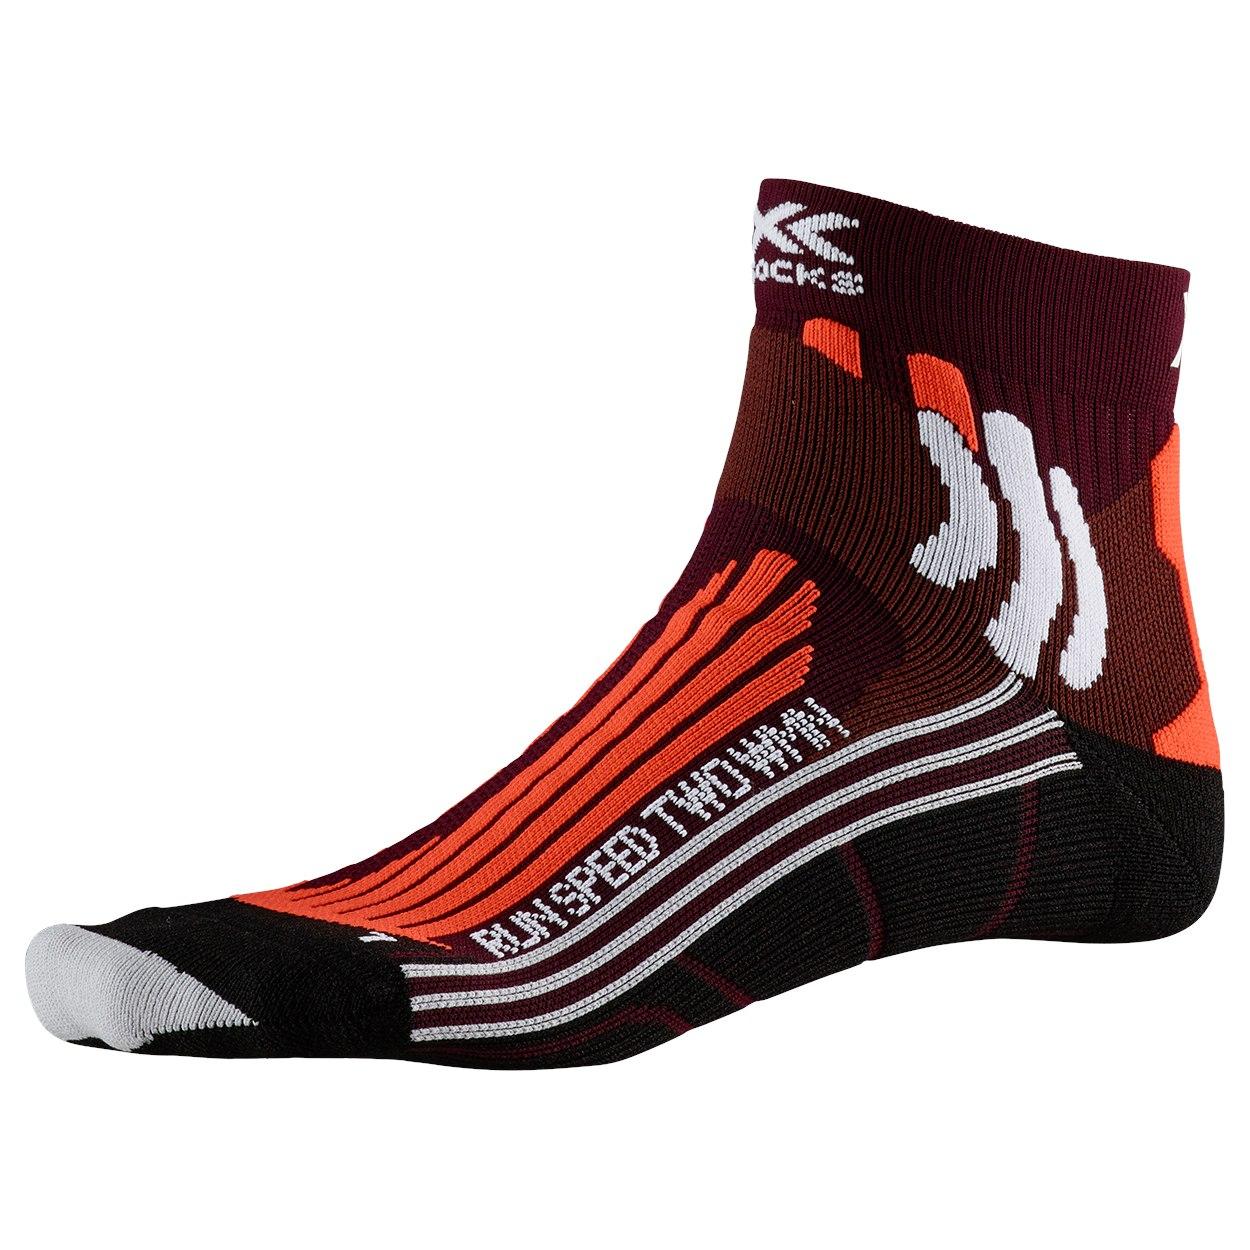 X-Socks Run Speed Two Socken für Damen - sunset orange/pearl grey